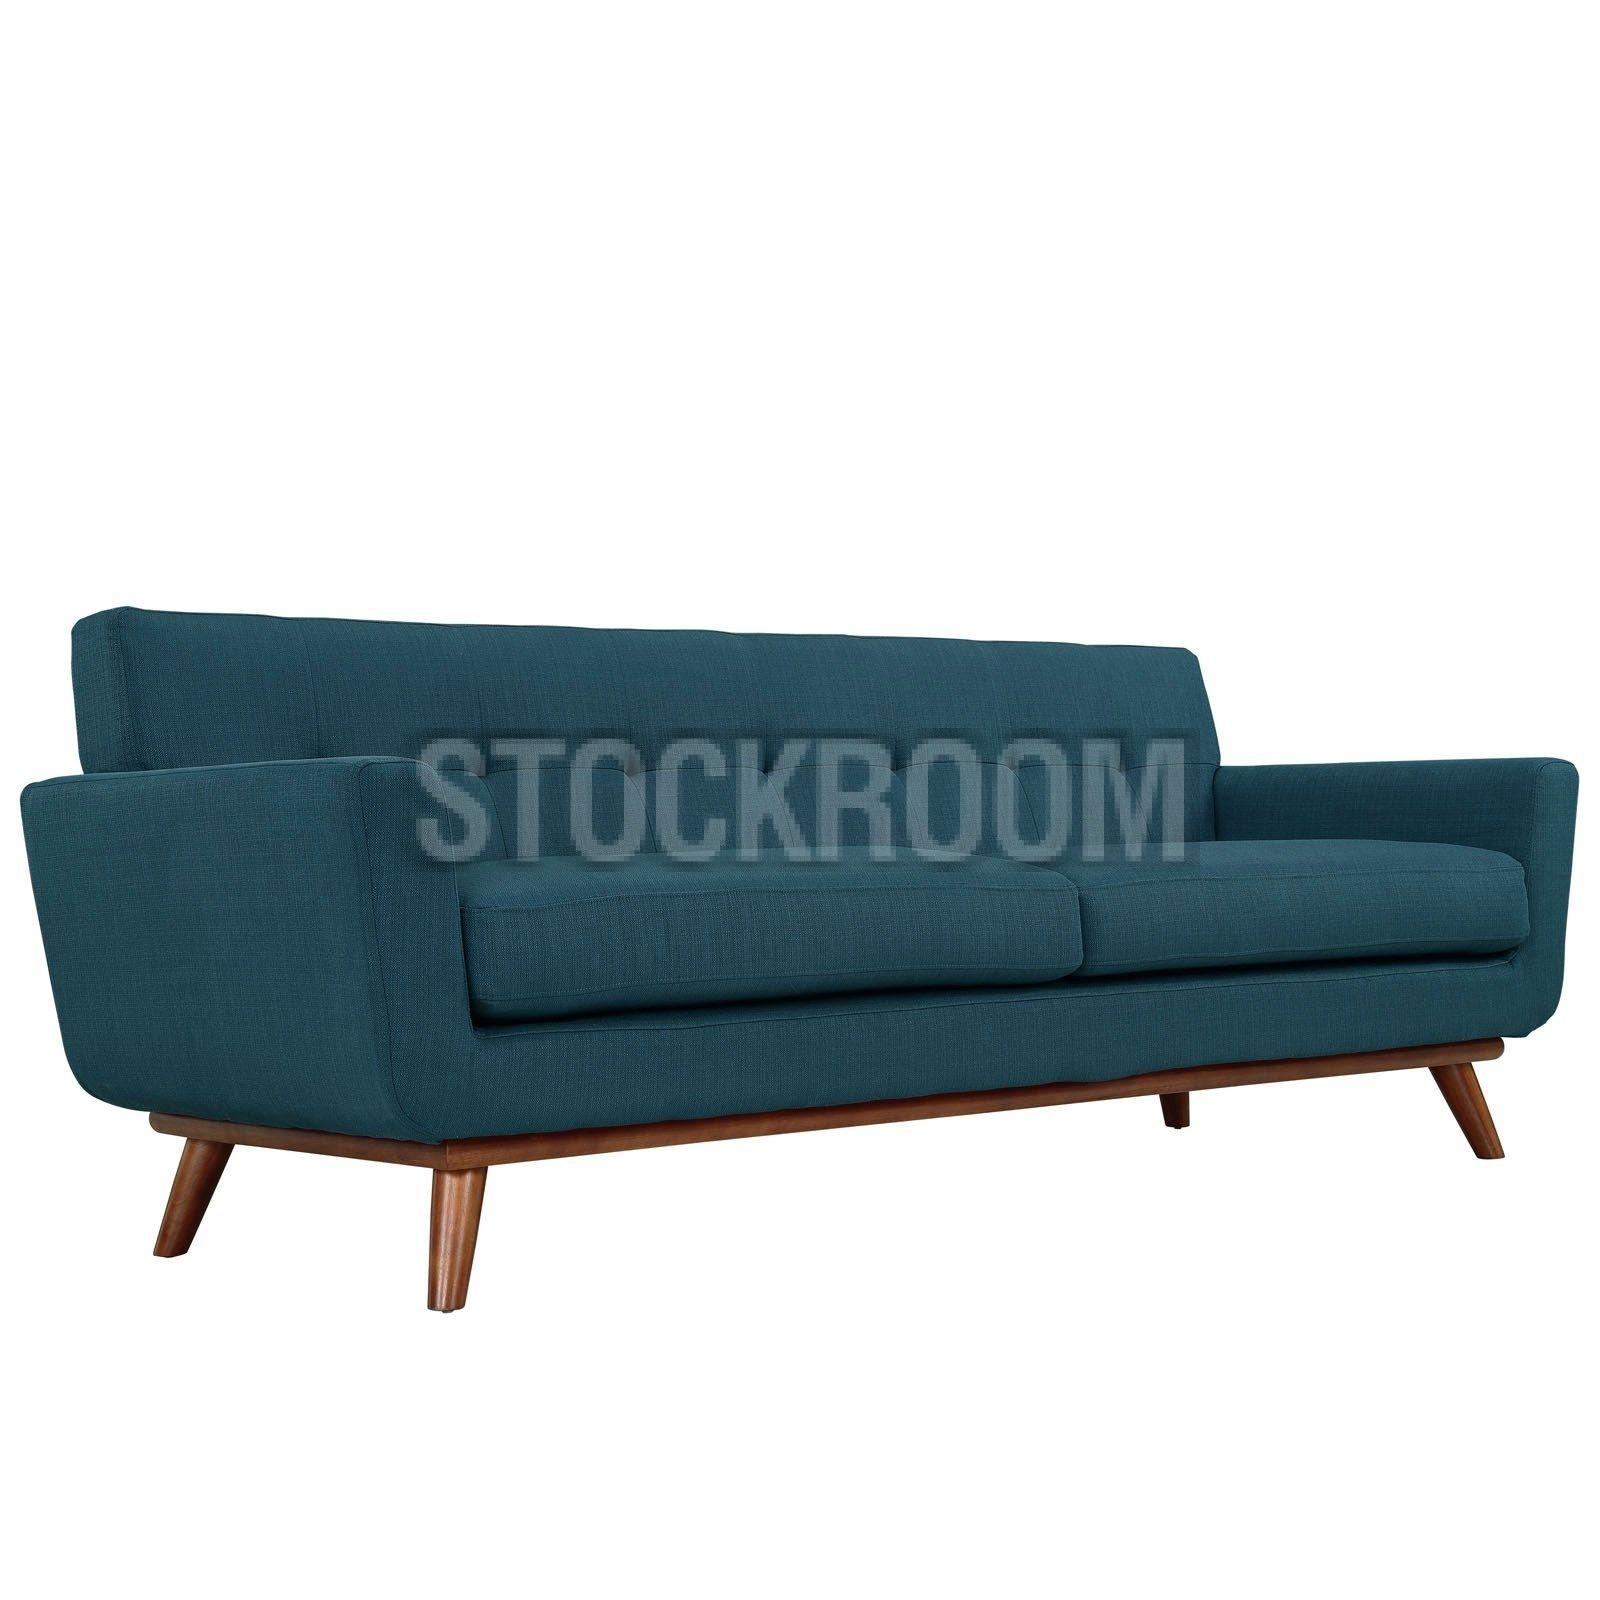 Aquarius Fabric Sofa 2 Seater : Stockroom Hong Kong Contemporary With Regard To Aquarius Dark Grey Sofa Chairs (Image 8 of 20)